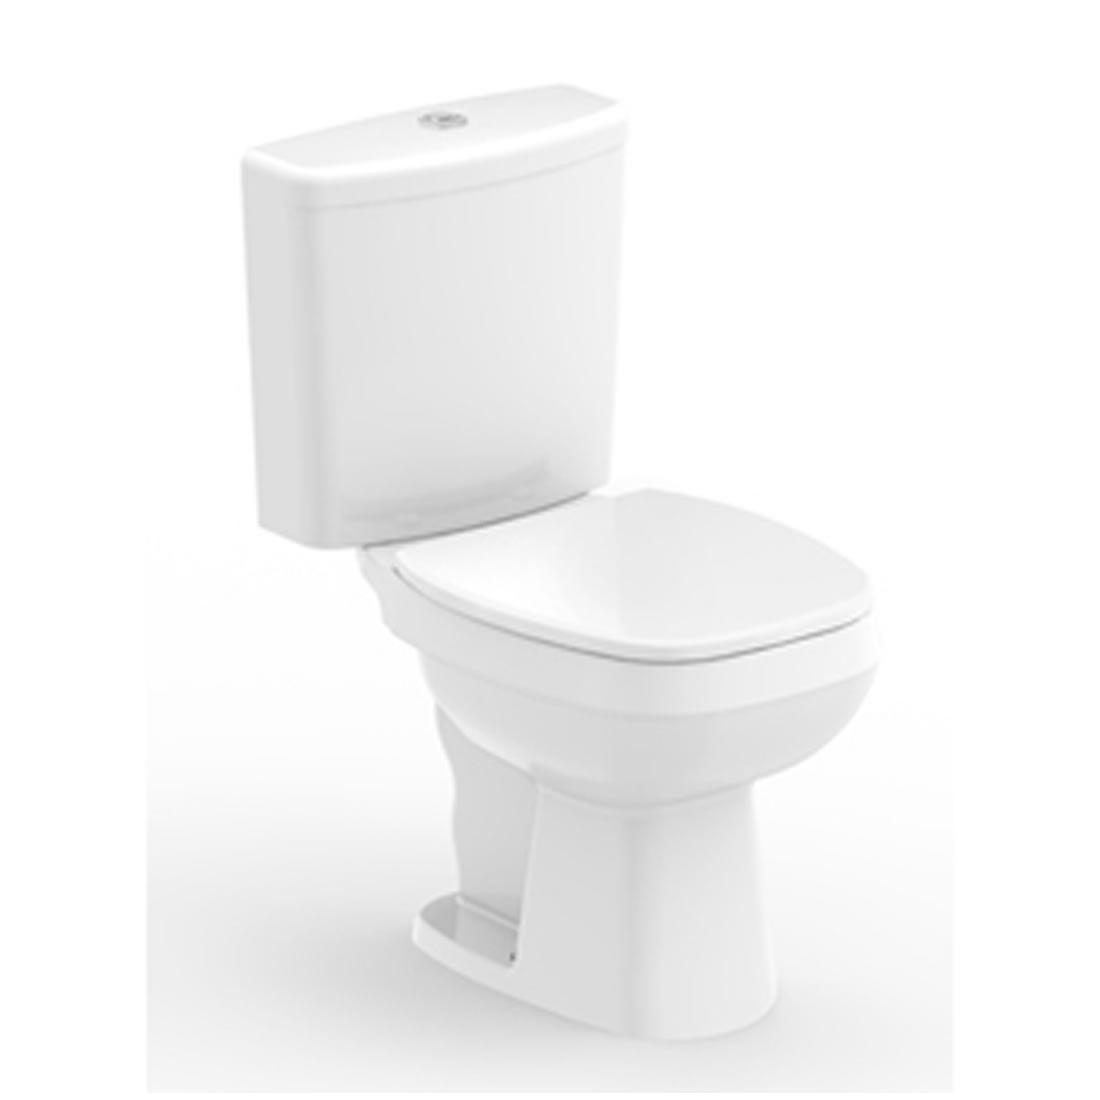 Conjunto Vaso Sanitário com Caixa Acoplada 3/6L Ecoflush City Branco Celite